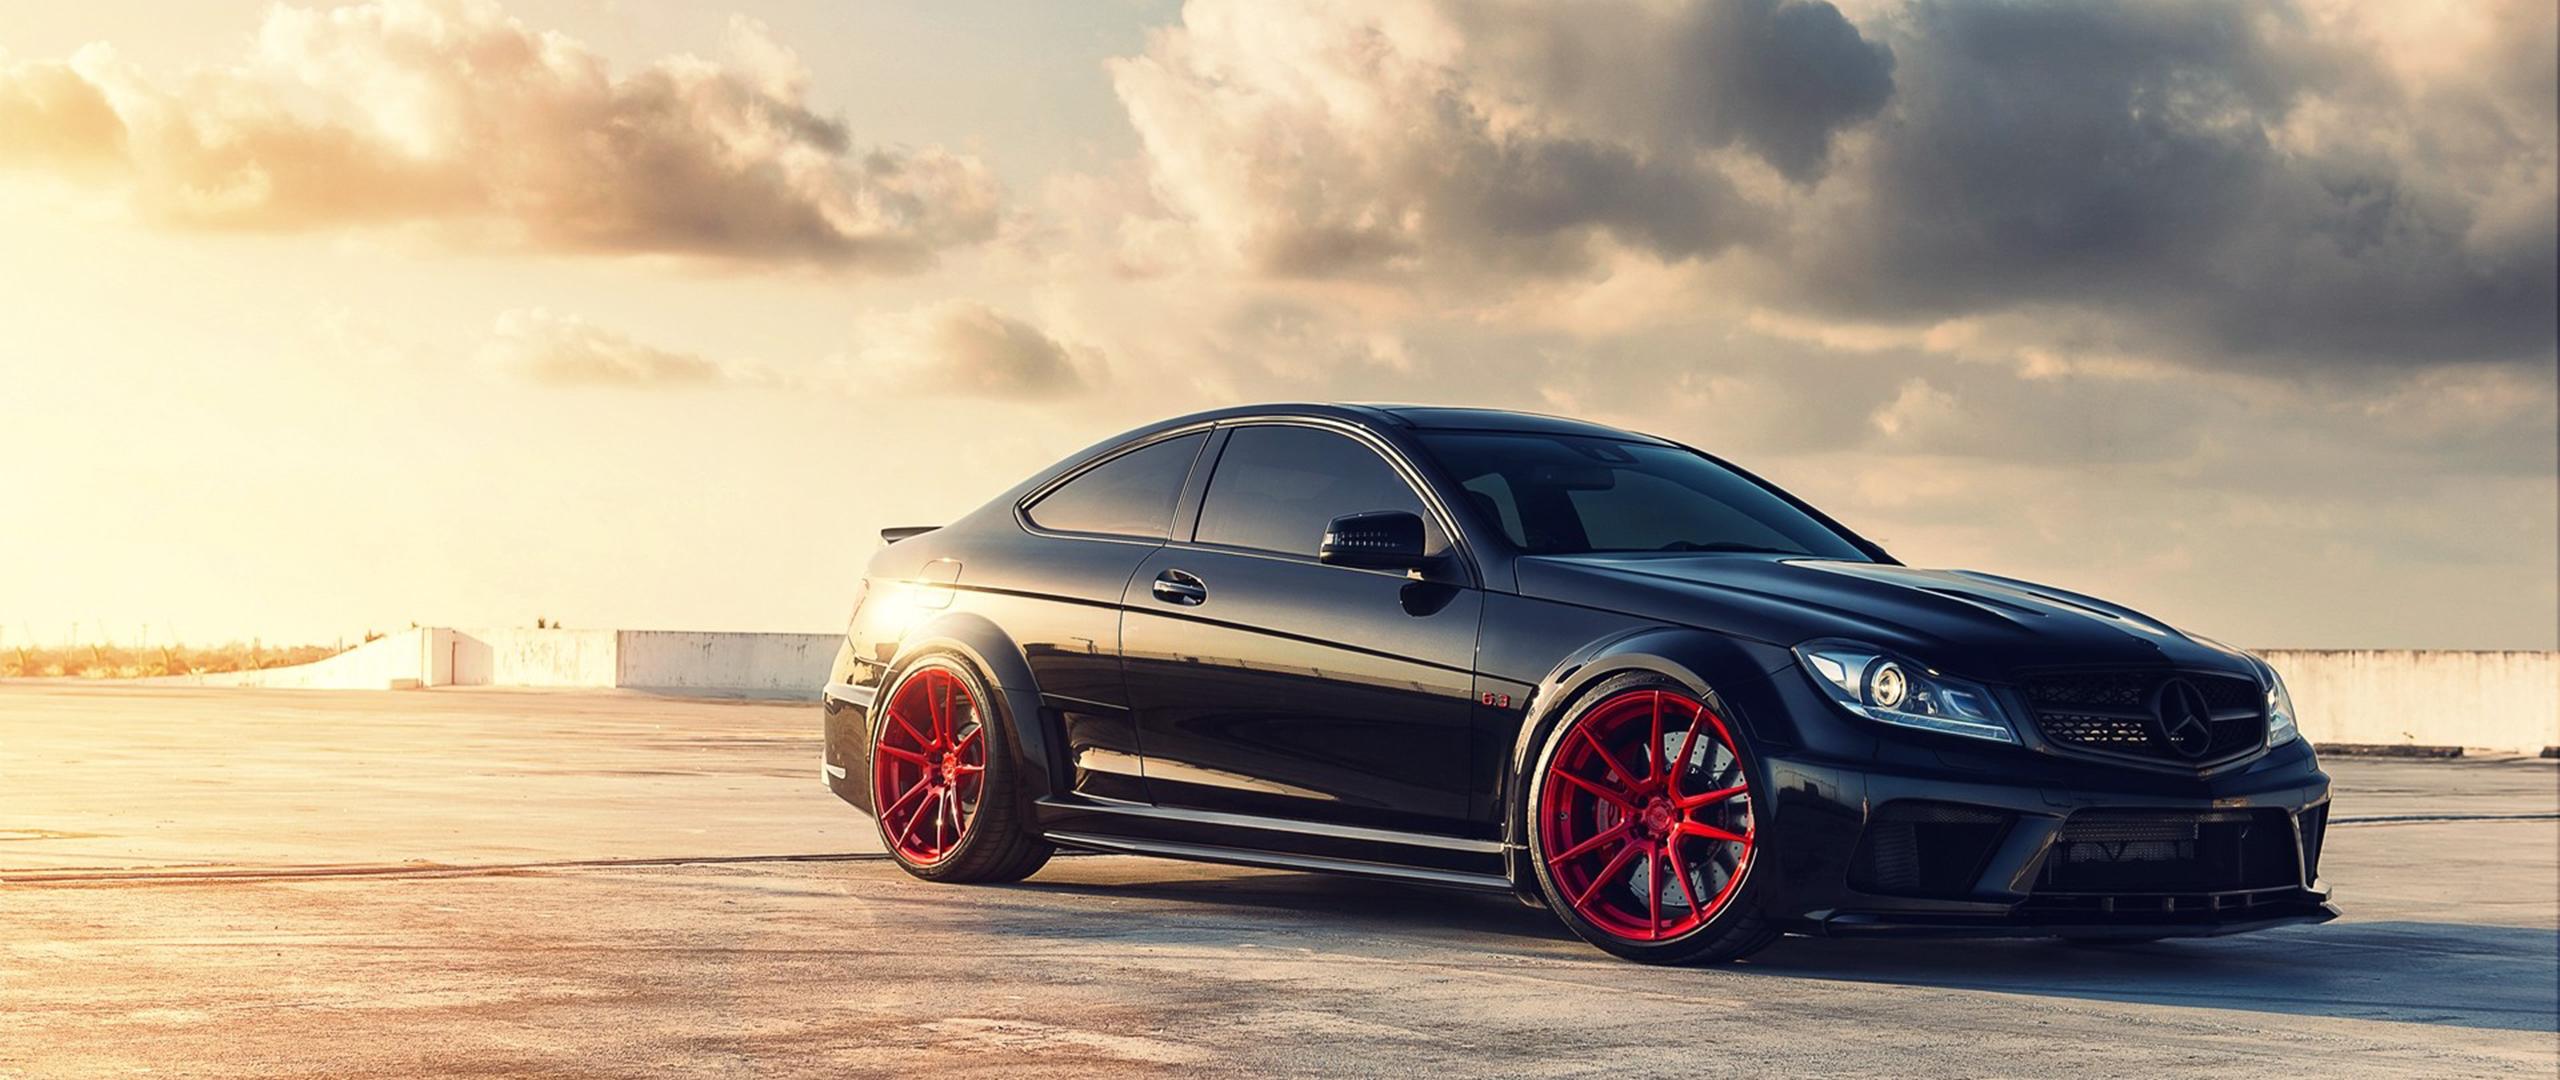 Wallpaper : BMW, Mercedes Benz, sports car, ultra wide, coupe ...